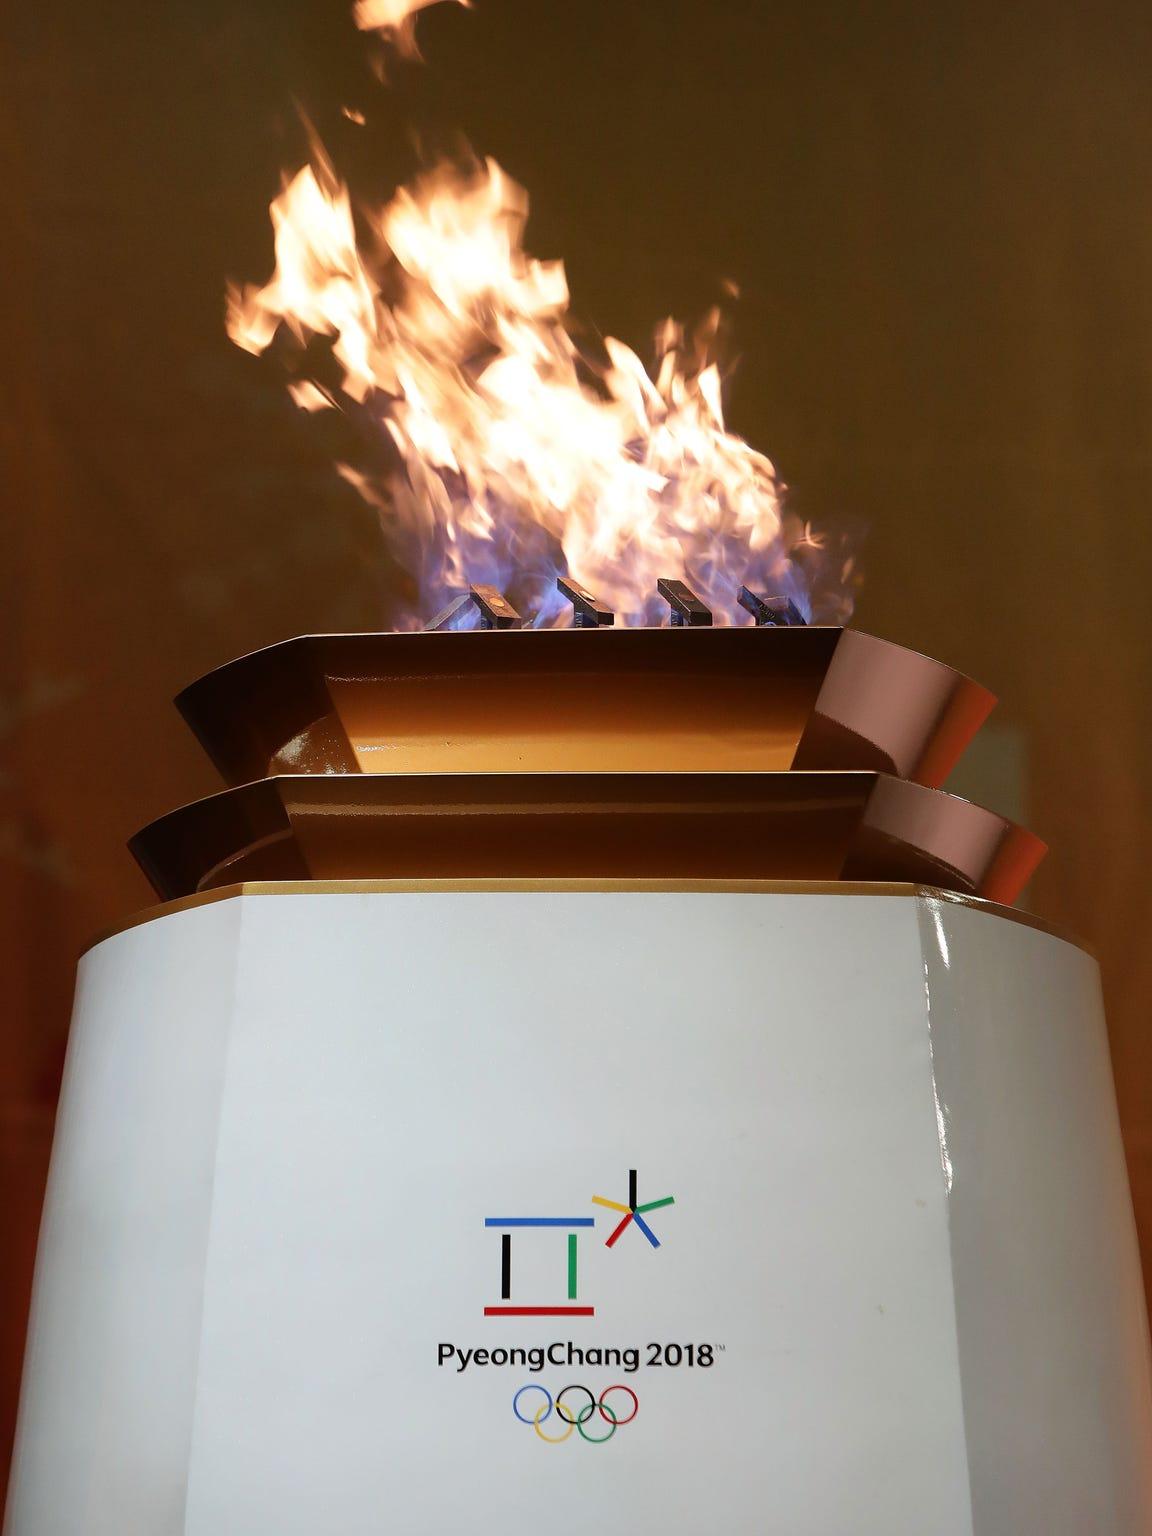 The PyeongChang 2018 Winter Olympics, like the 2016